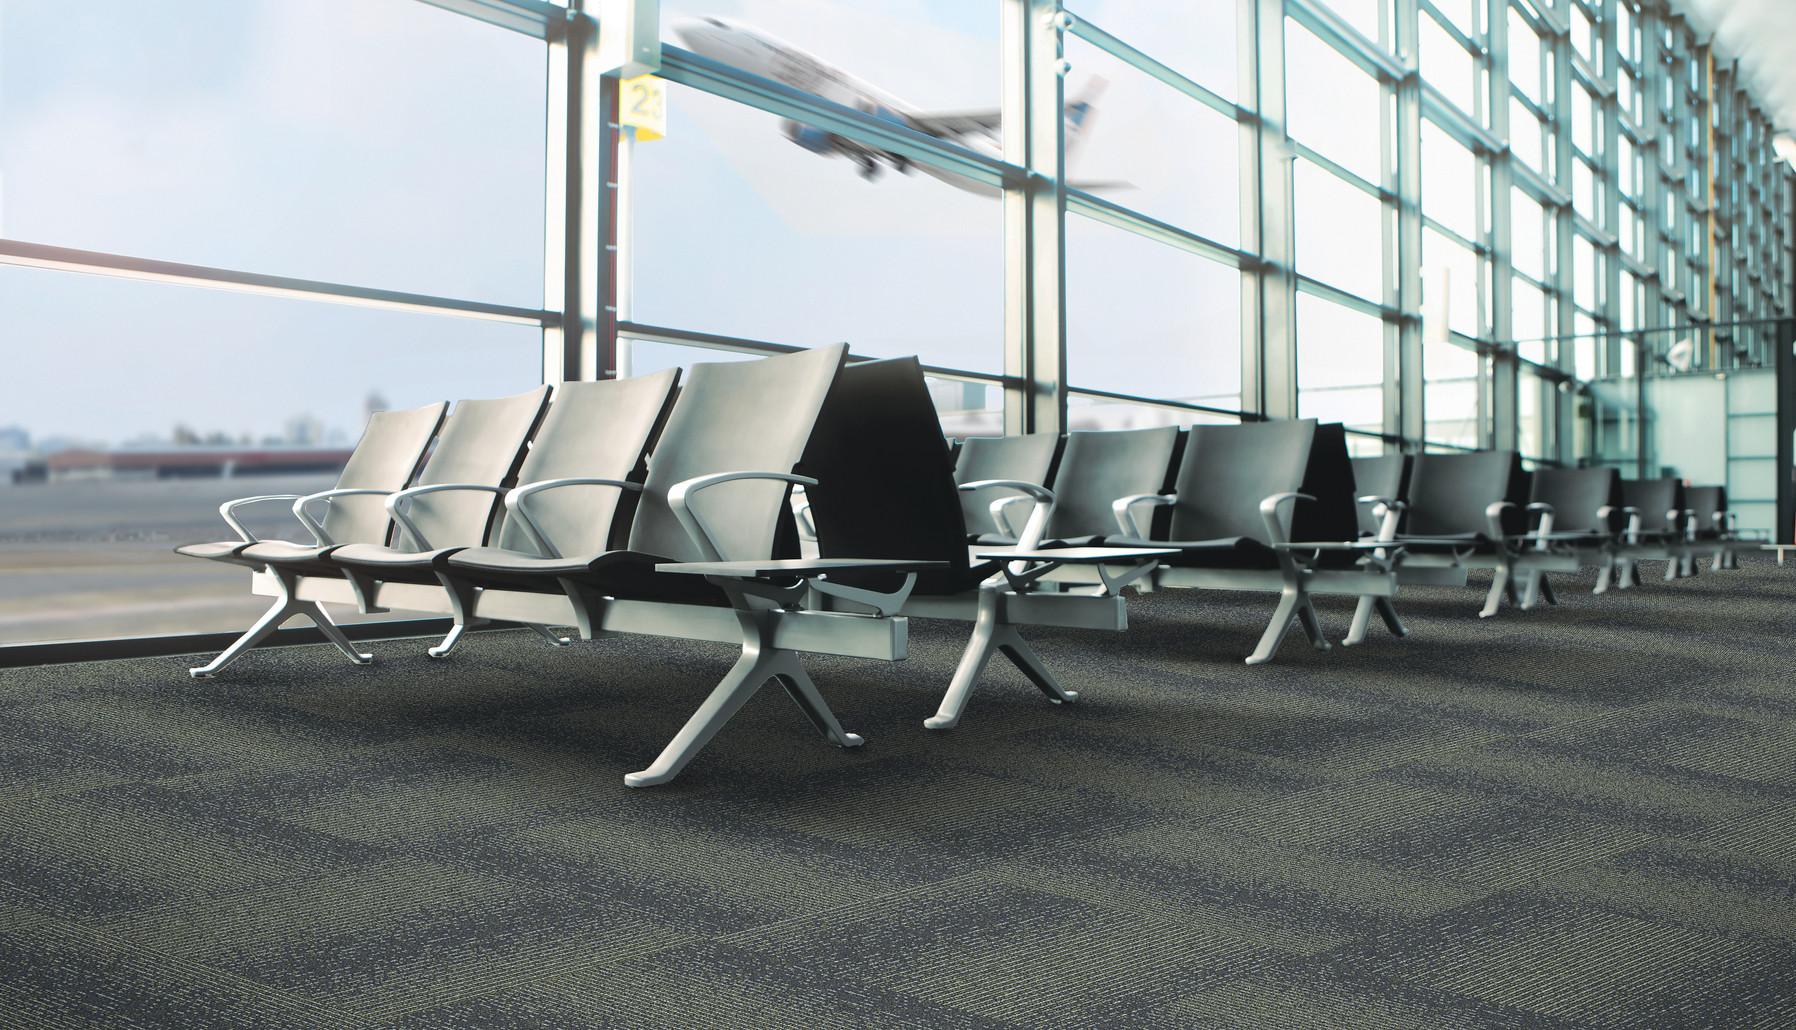 Carpetes para Aeroporto